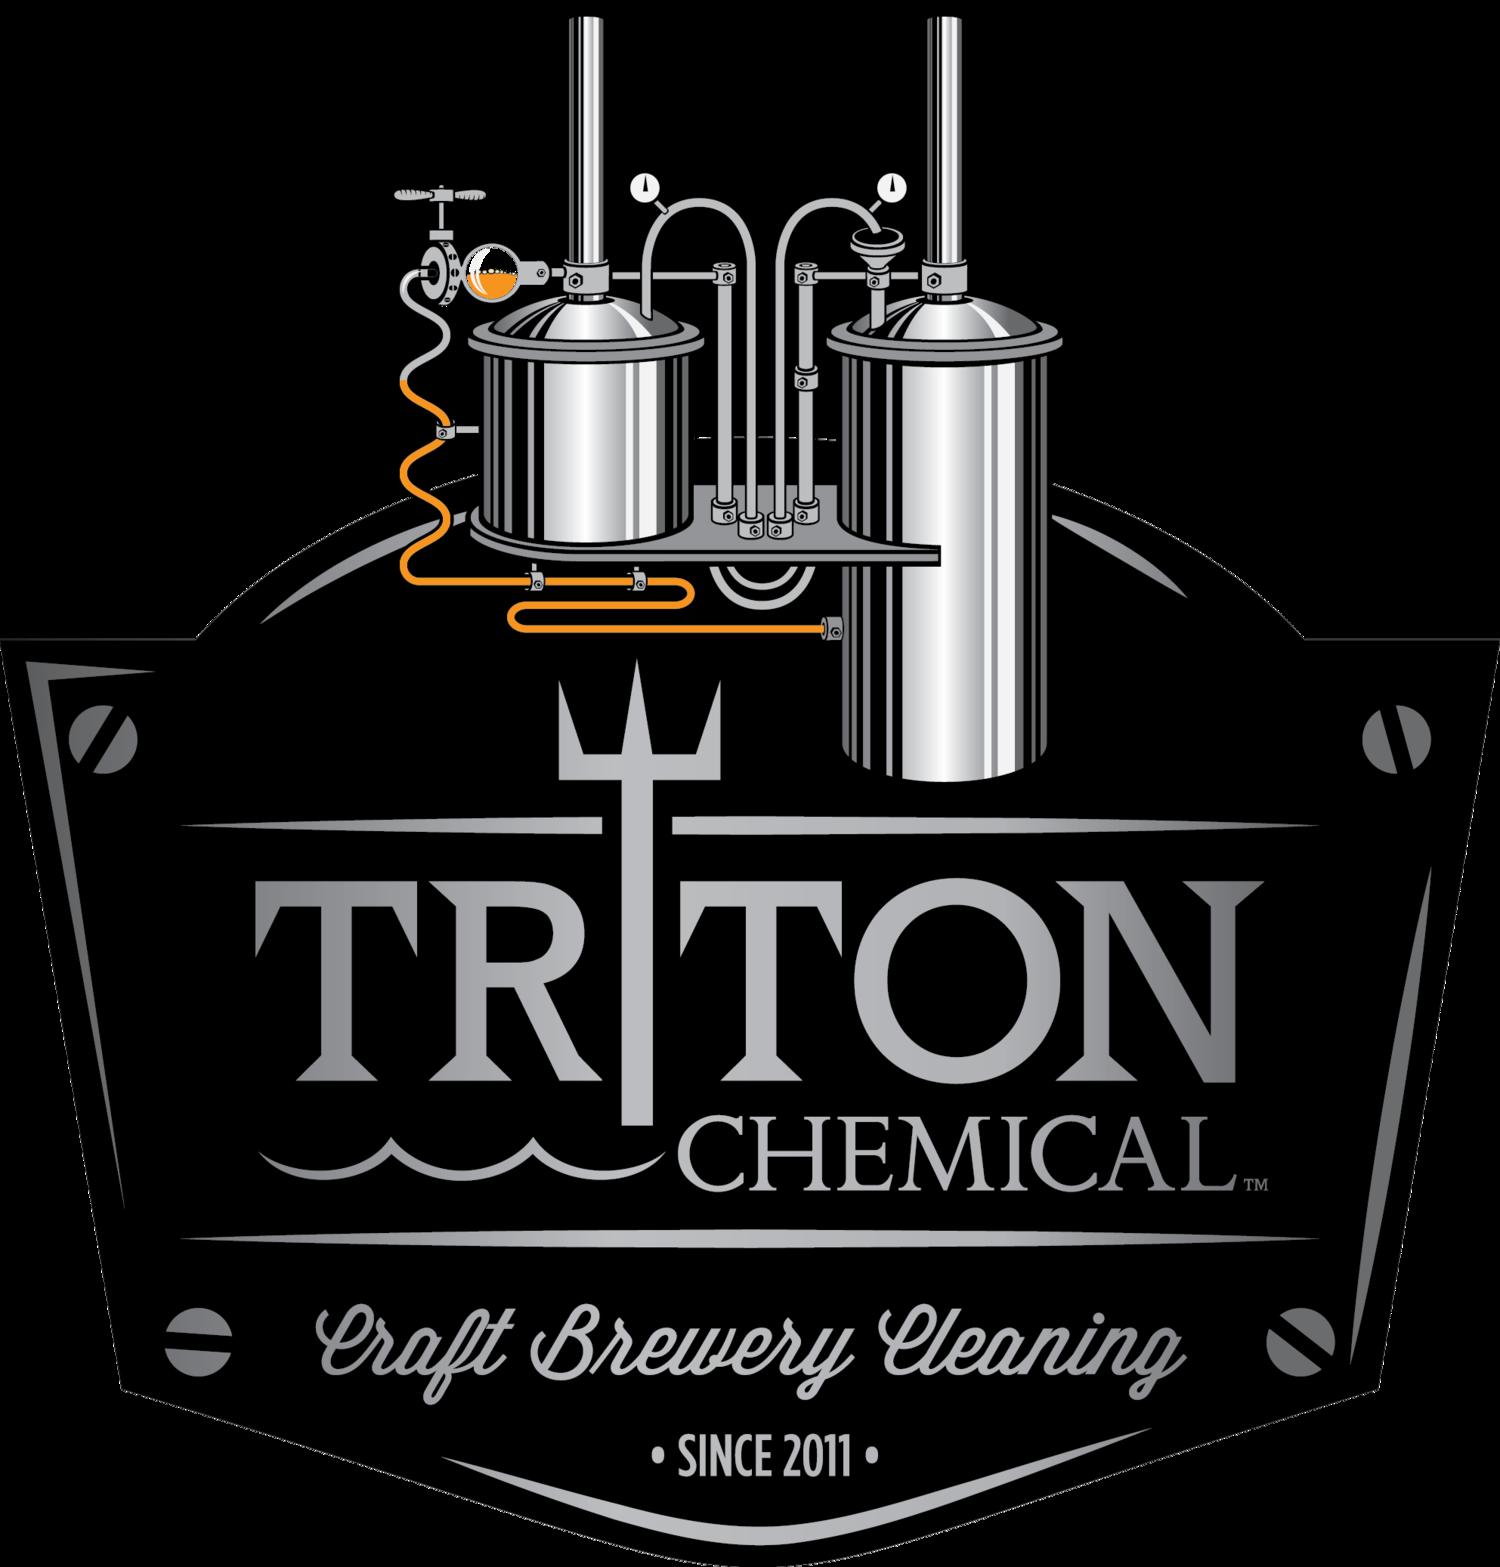 Triton Chemical.png